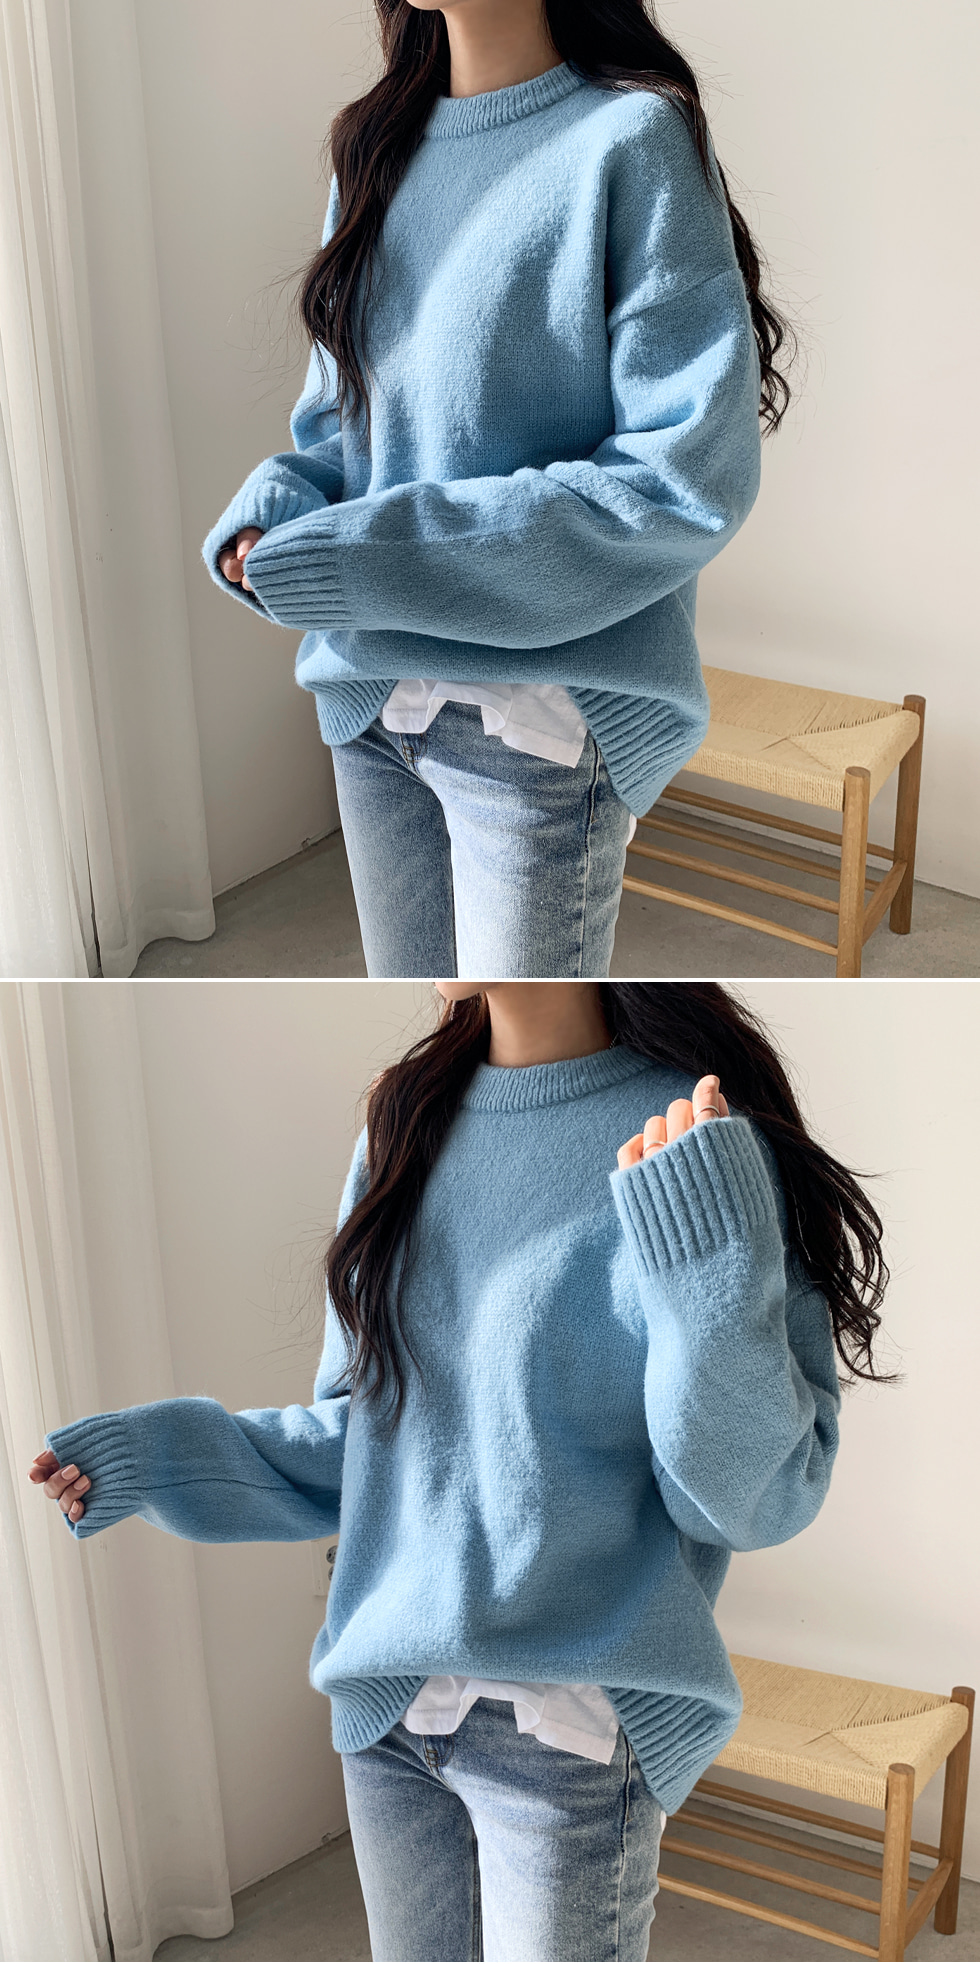 My Pick Round Knitwear